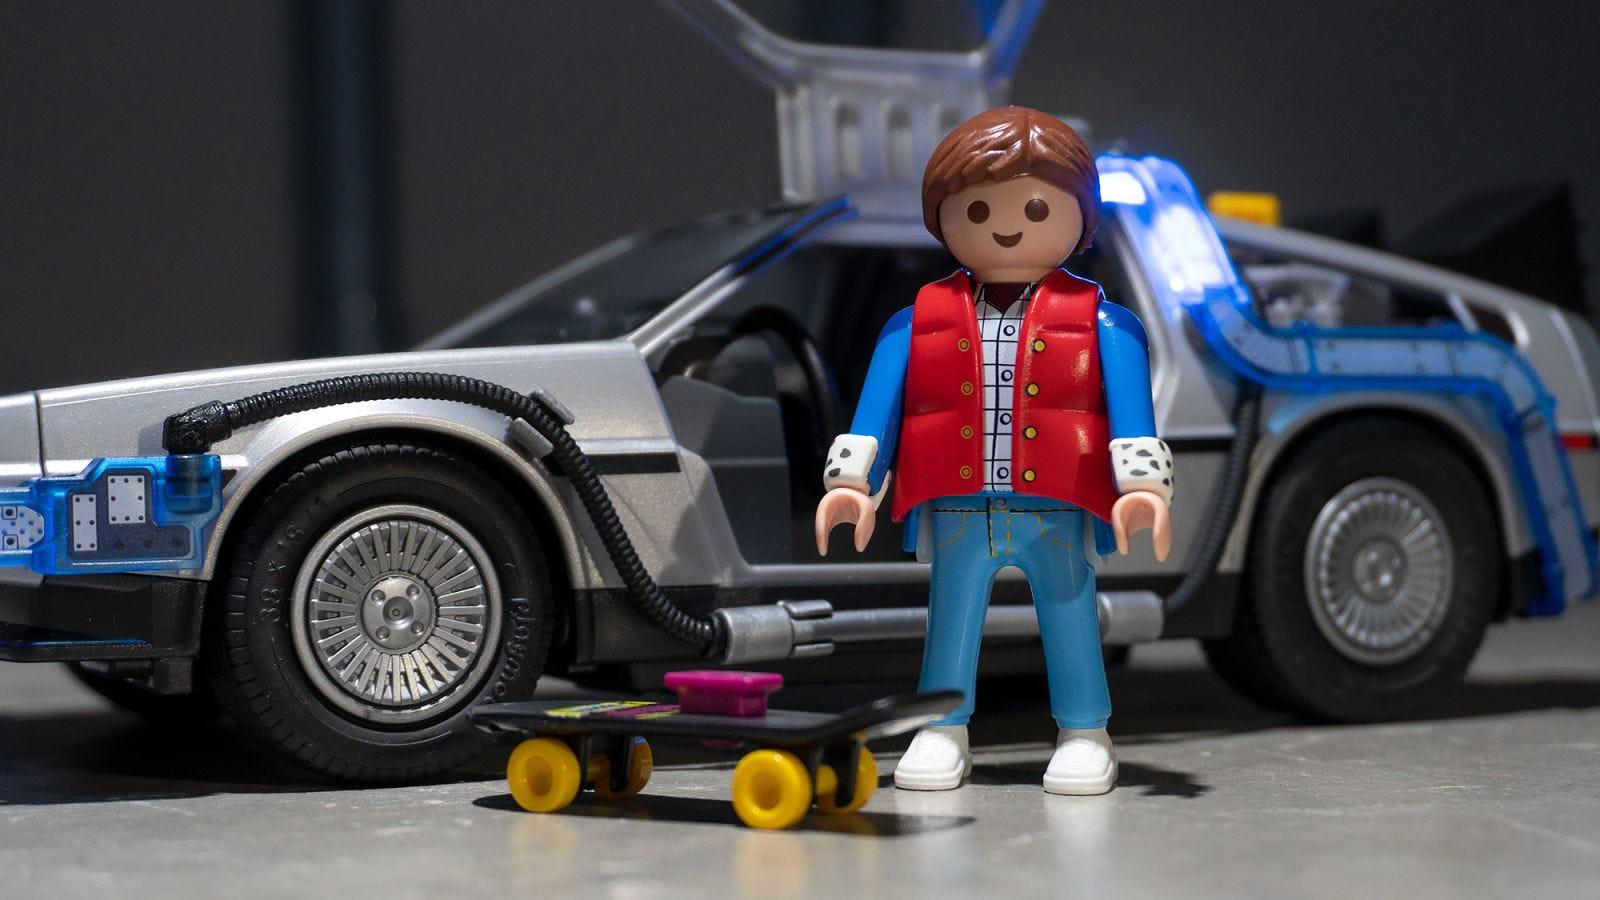 Illustration for article titled Playmobil acaba de lanzar el set definitivo de iBack to the Future/i (DeLorean incluido)